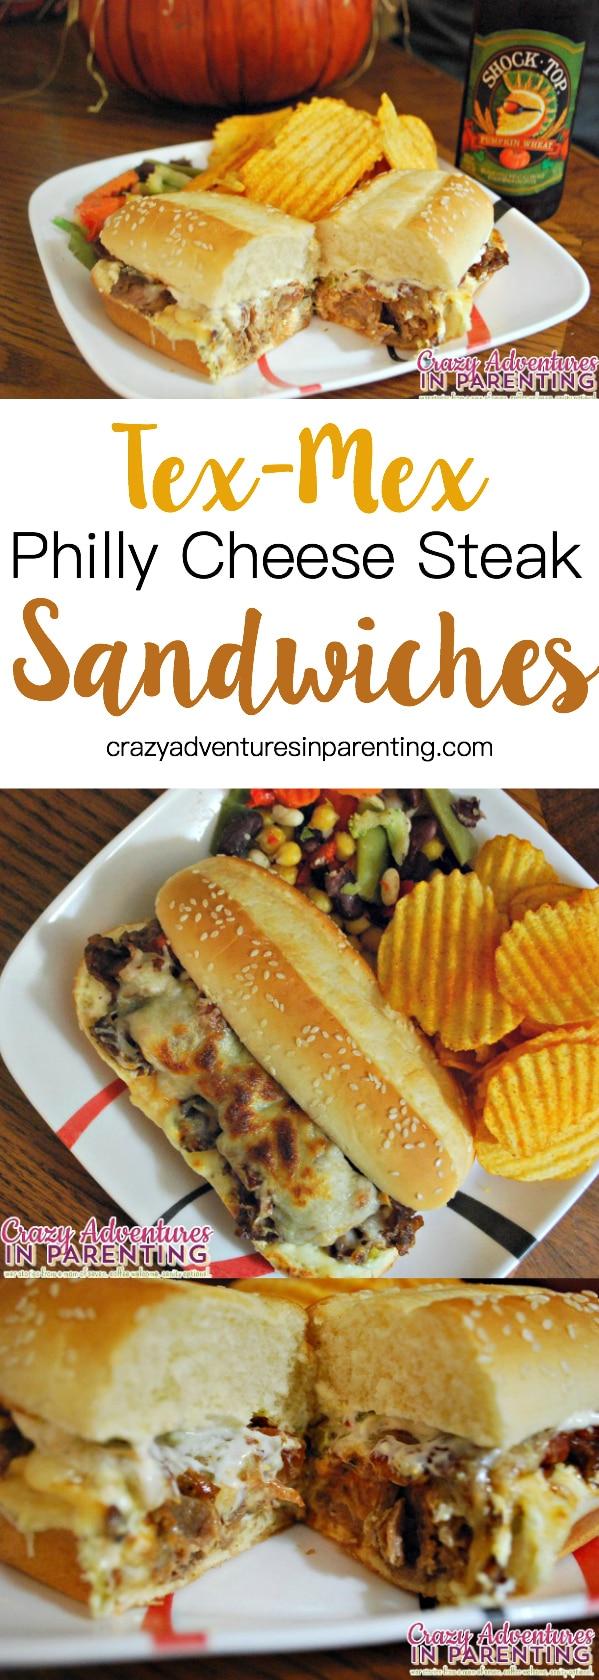 Tex-Mex Philly Cheese Steak Sandwiches